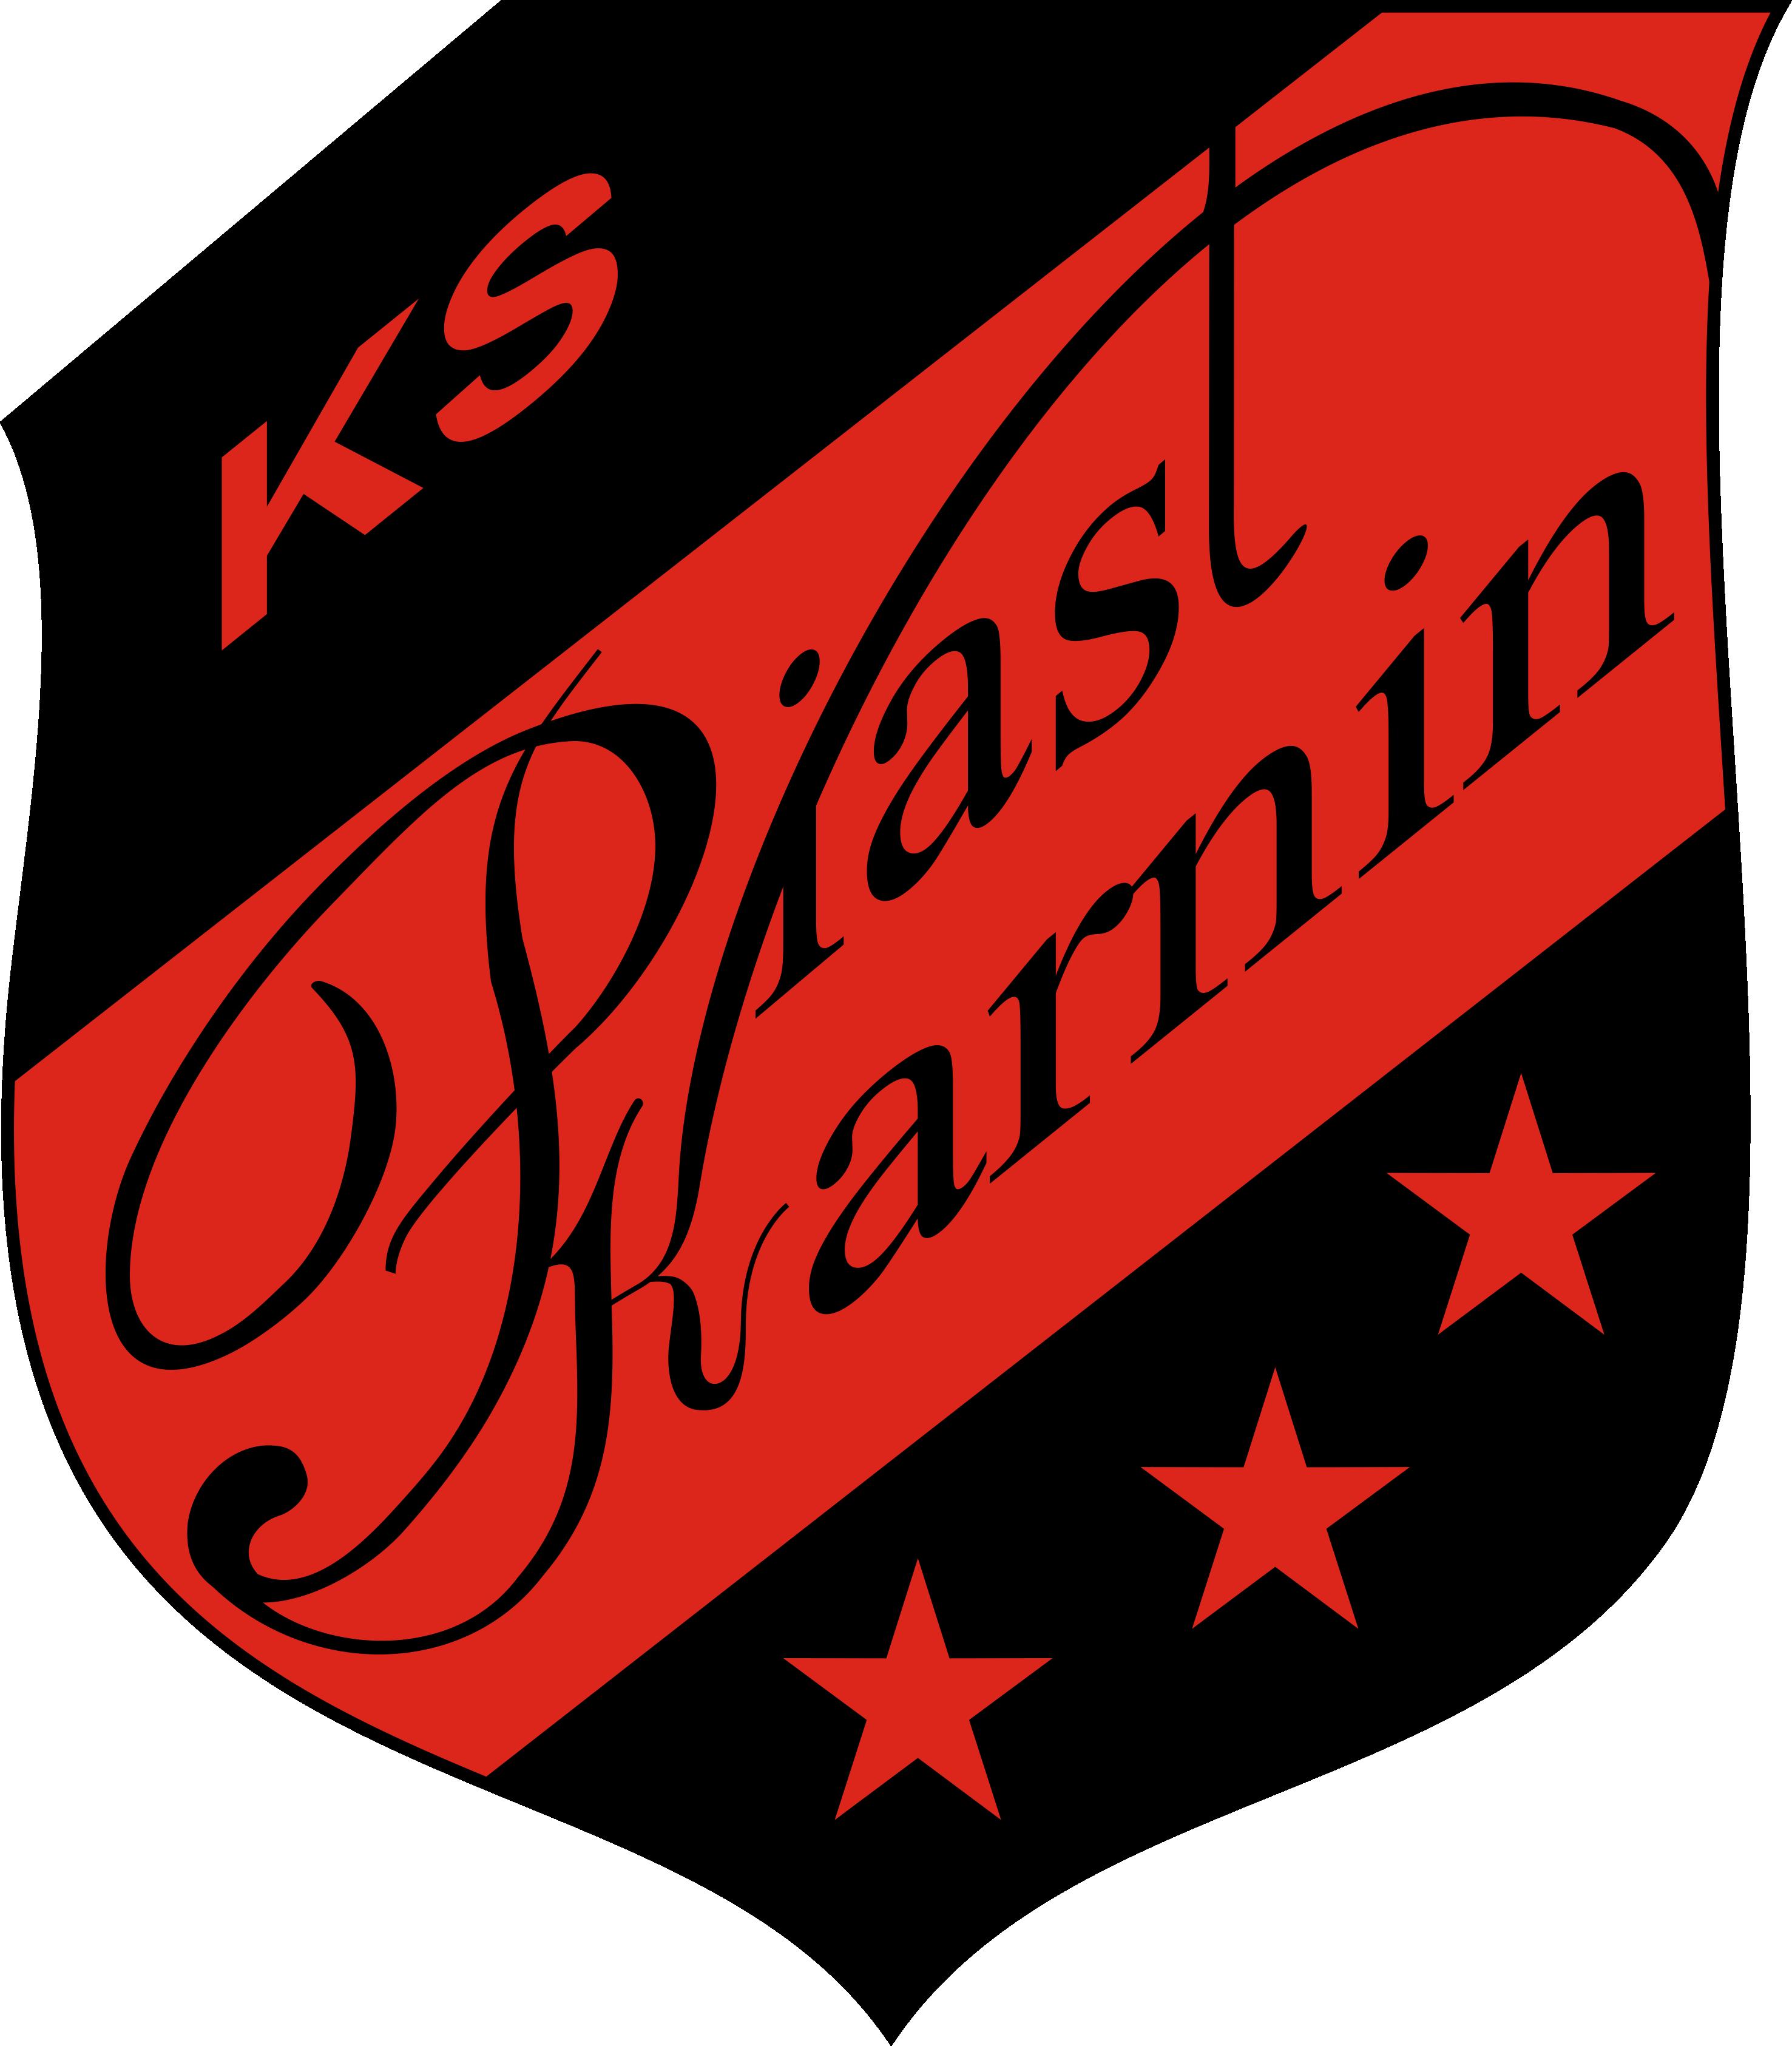 https://d1yjjnpx0p53s8.cloudfront.net/082012/piast_karnin.png